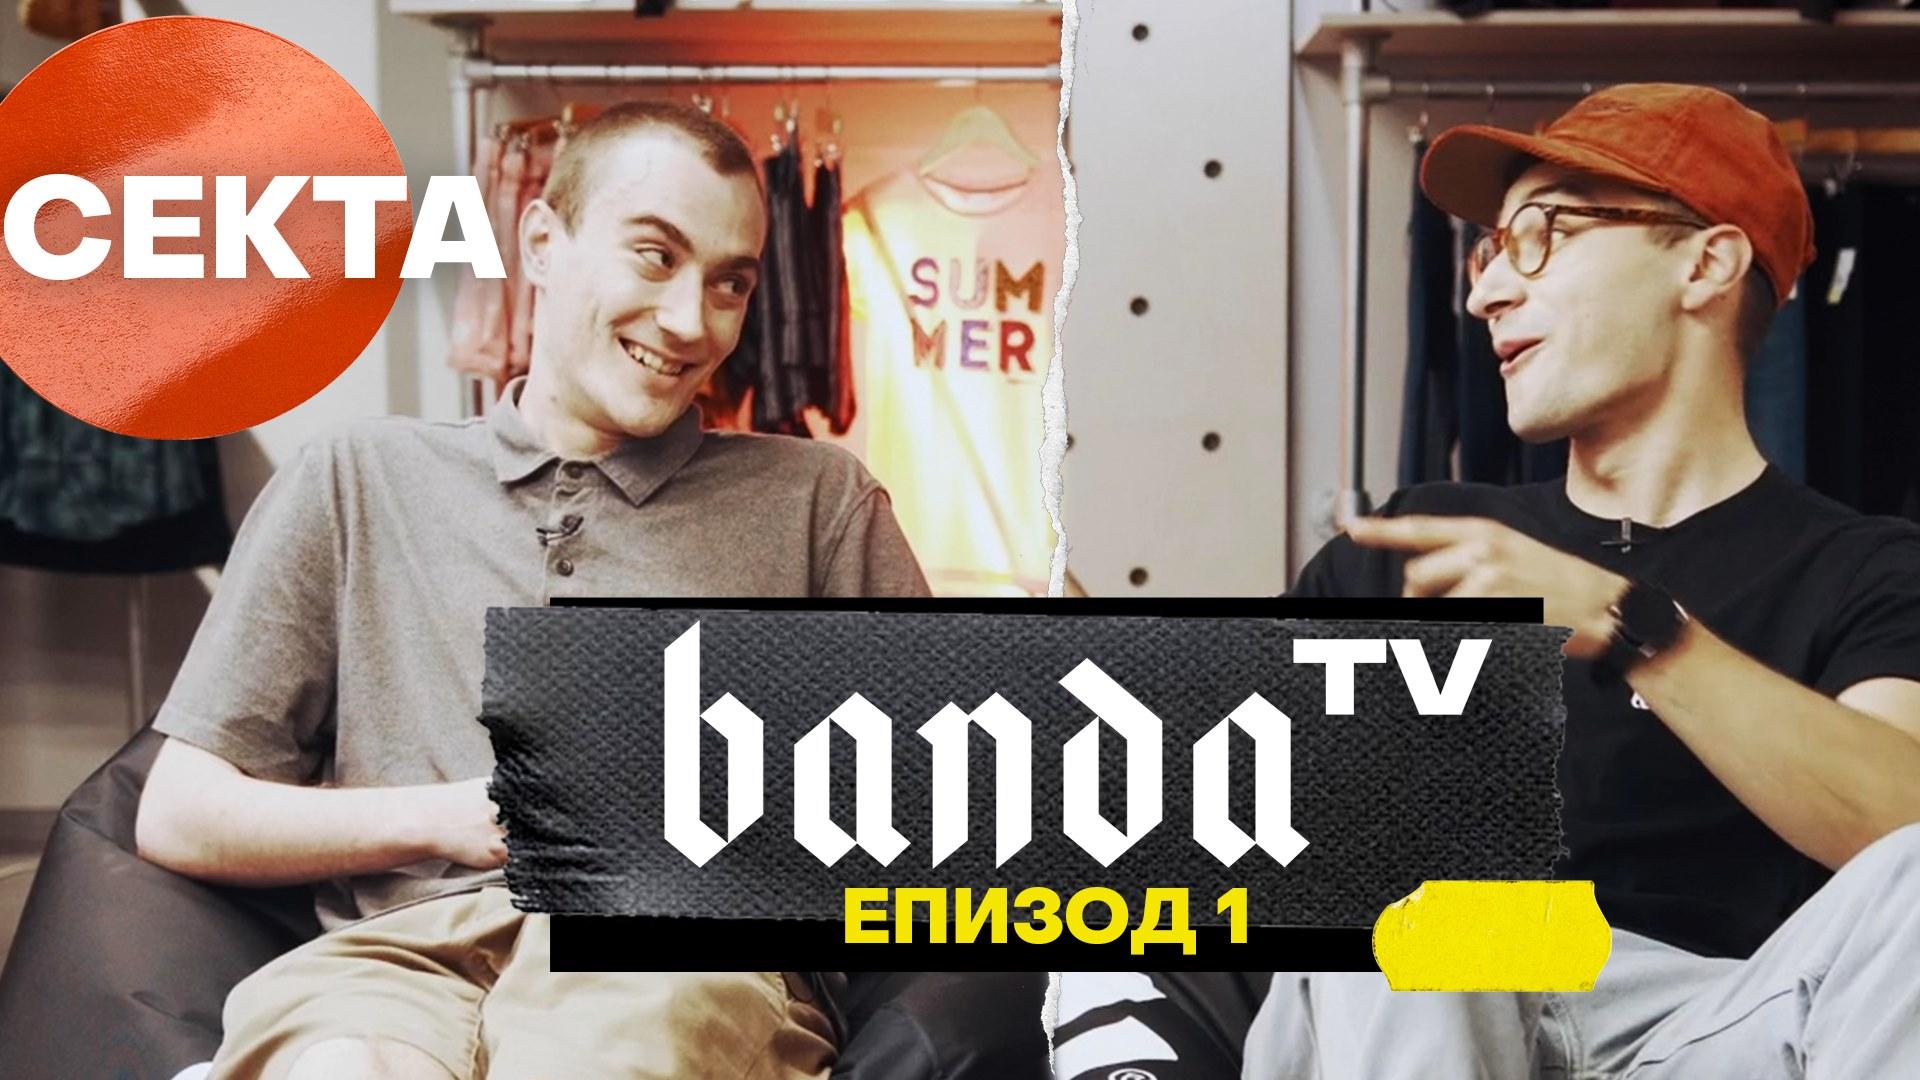 Banda TV - Eпизод 1 със СЕКТА